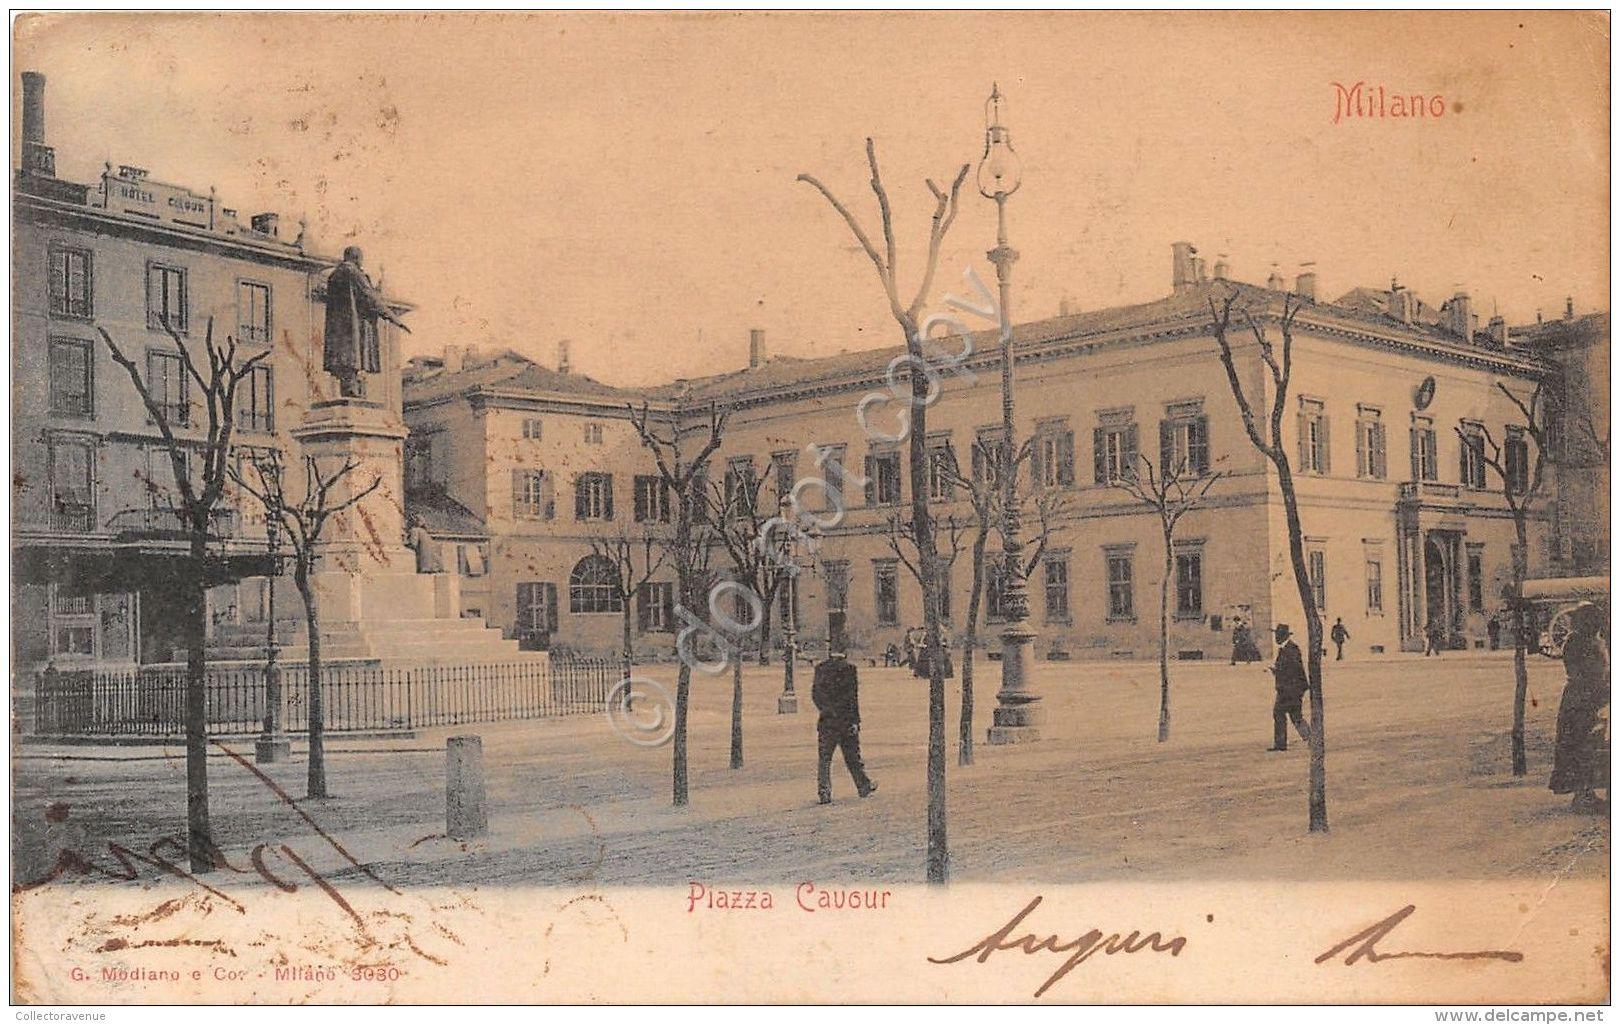 Cartolina - Postcard - Milano - Piazza Cavour - Animata - Italia